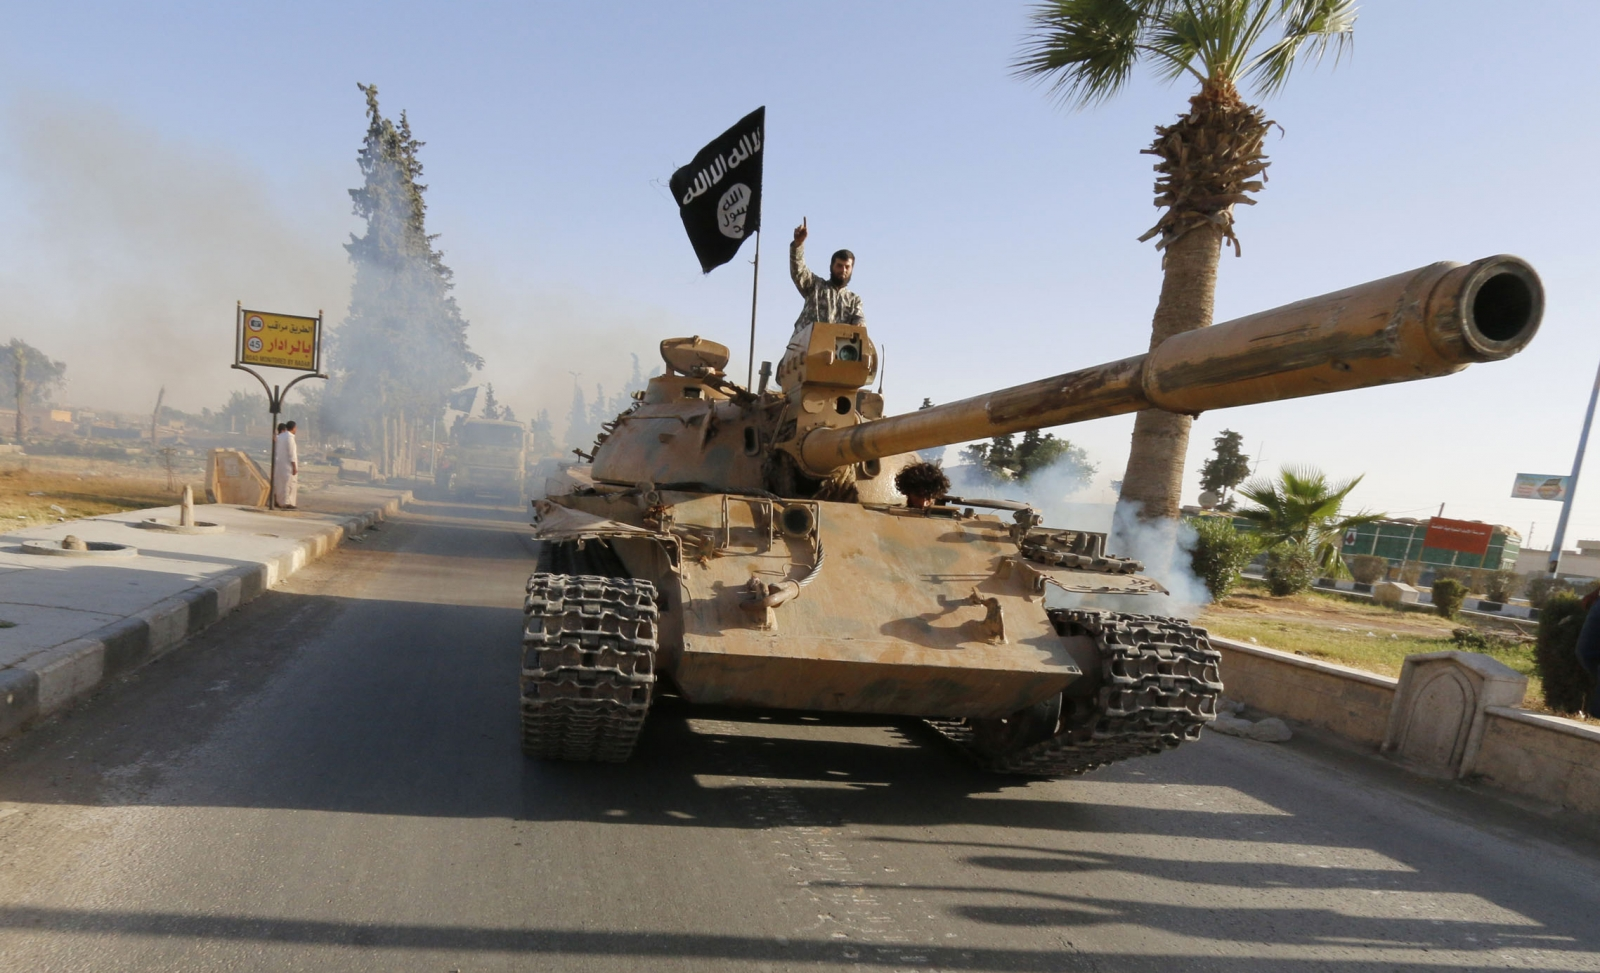 Isis militants in Raqqa